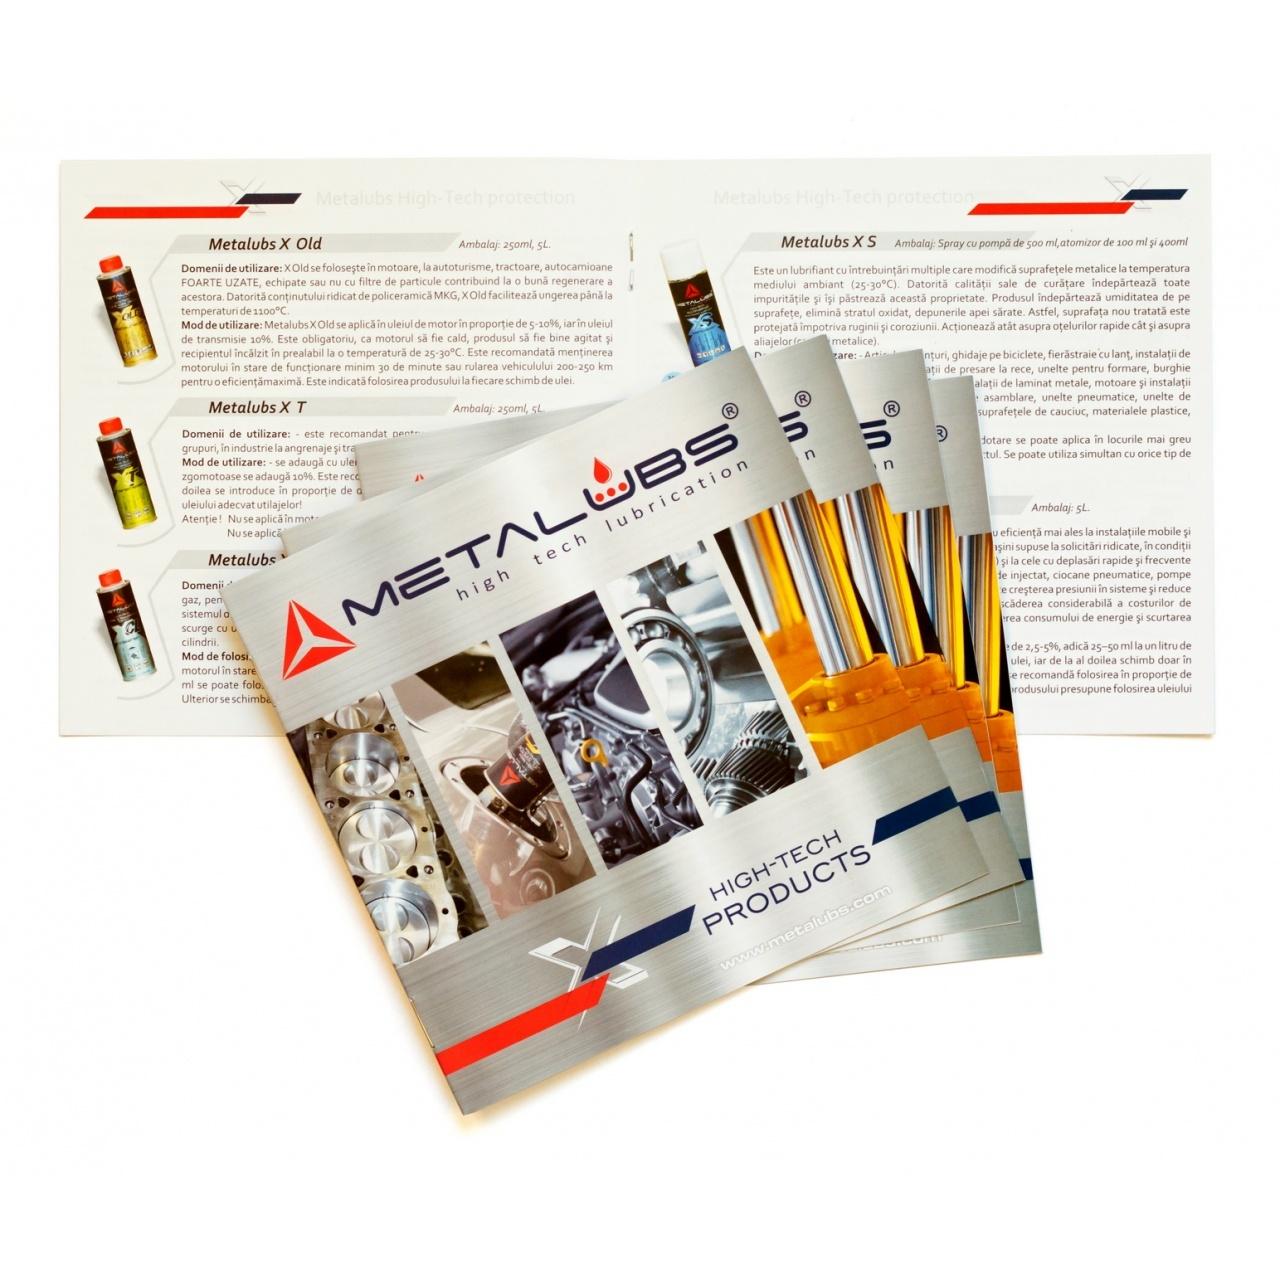 German product catalog